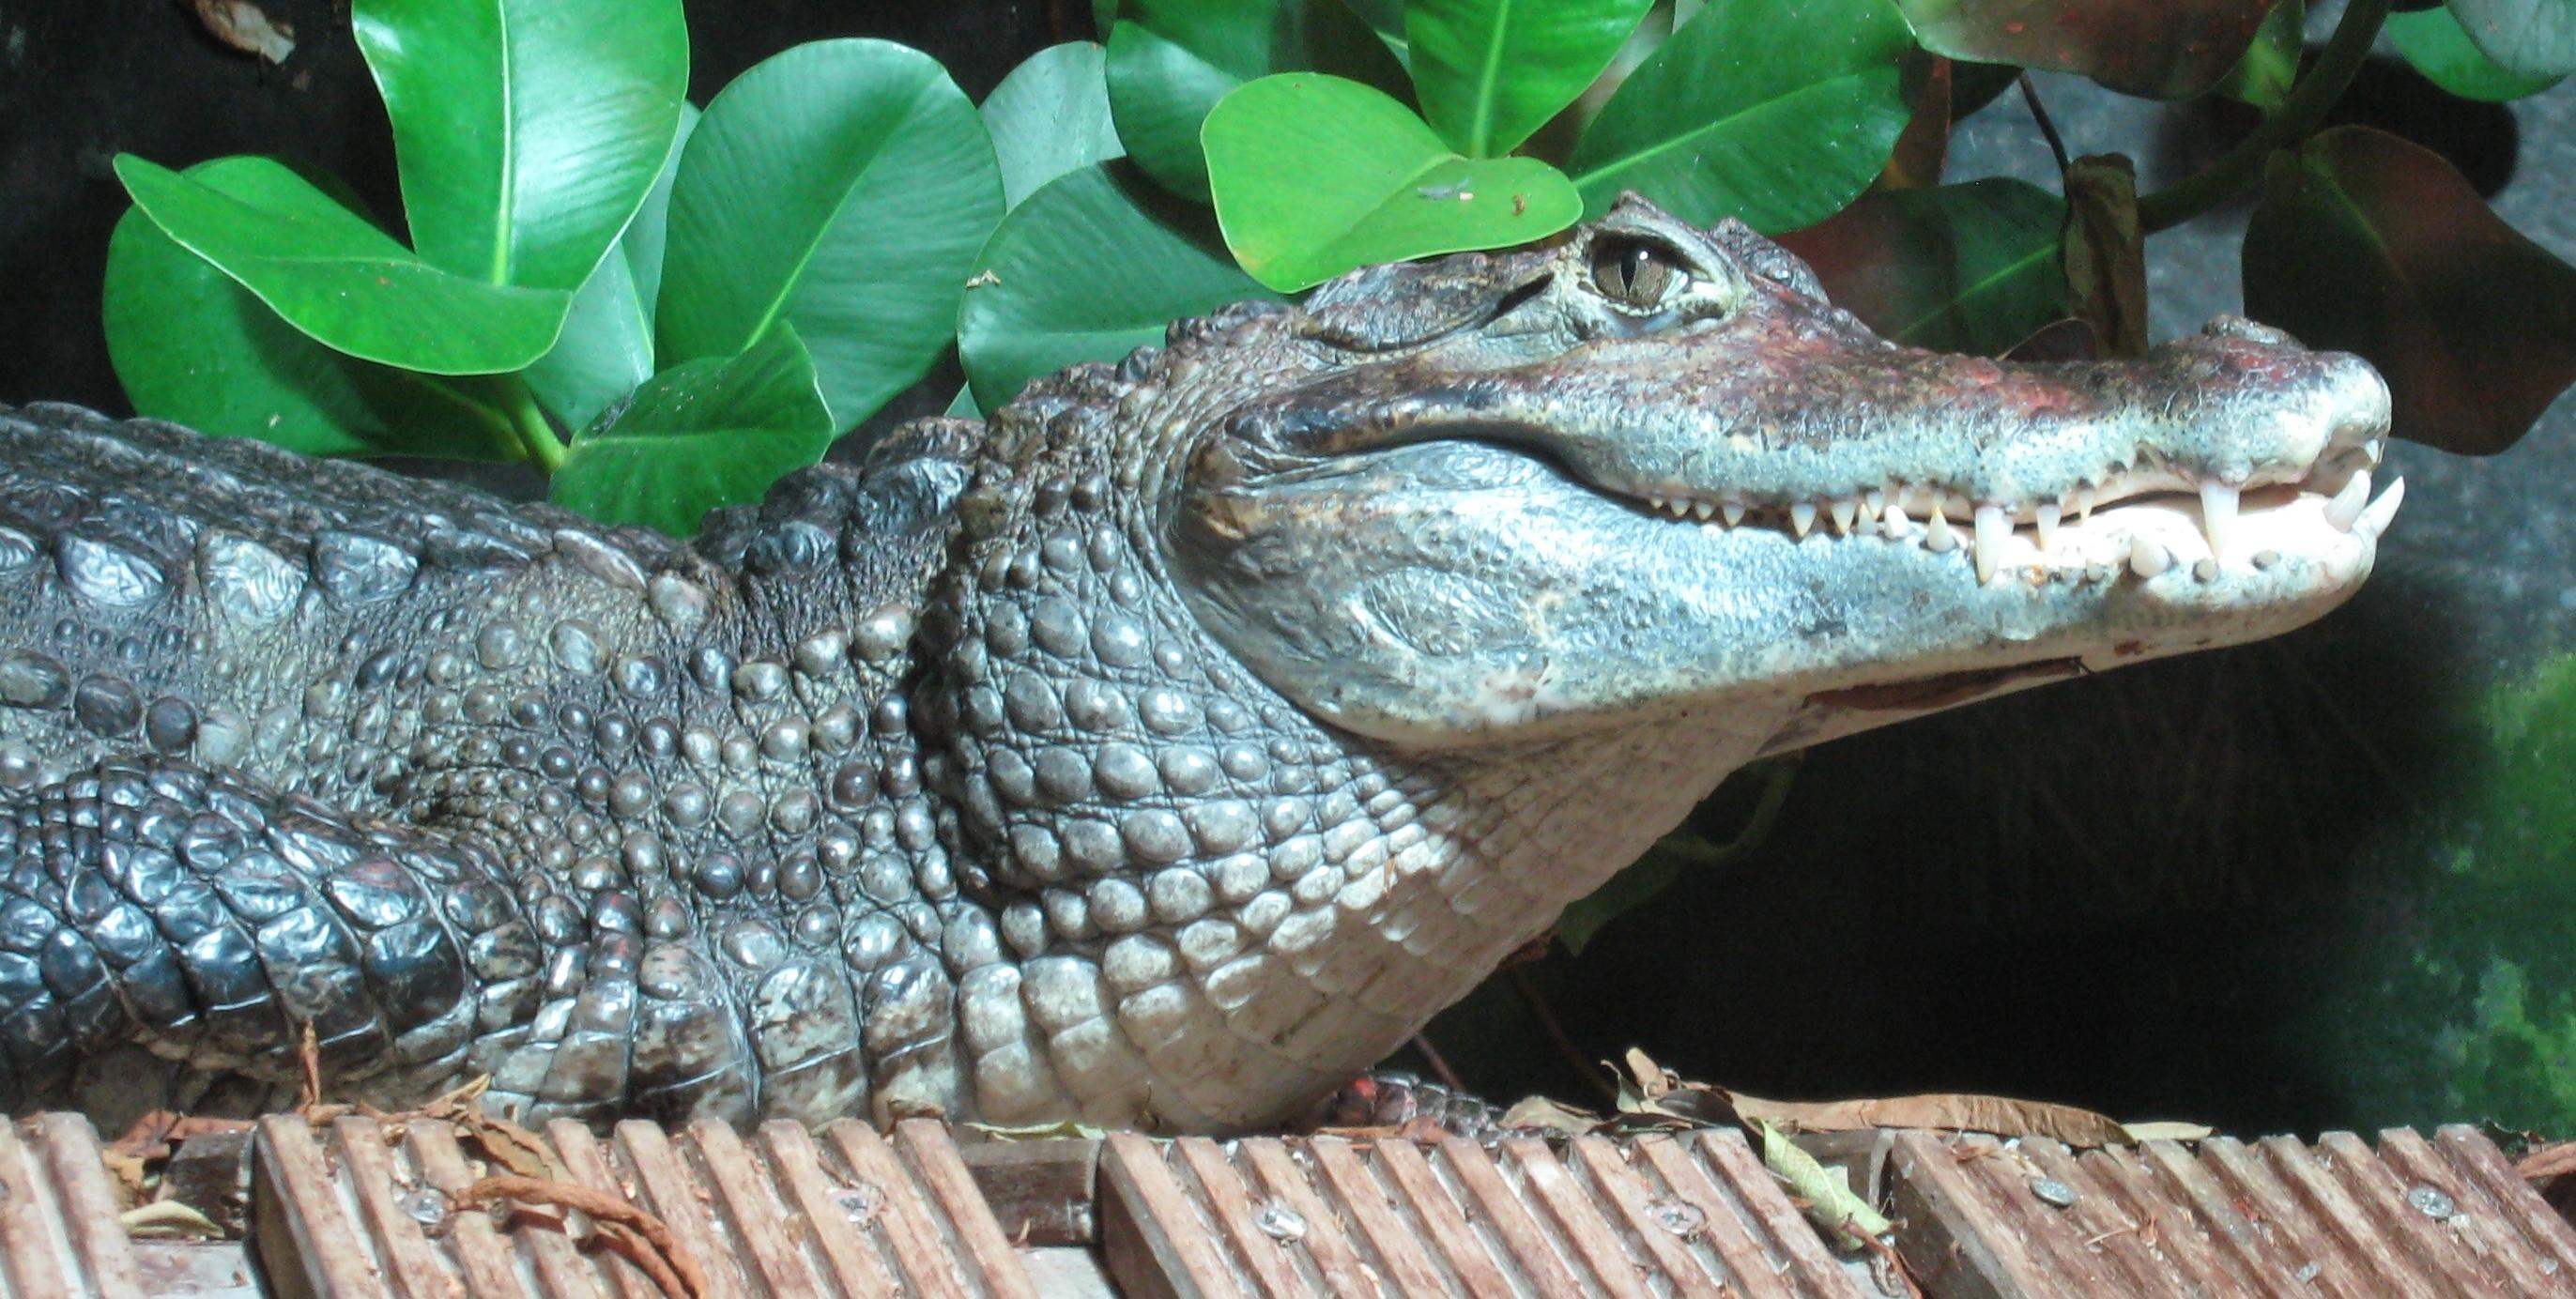 http://upload.wikimedia.org/wikipedia/commons/e/e8/Caiman_crocodilus_Nausicaa.jpg